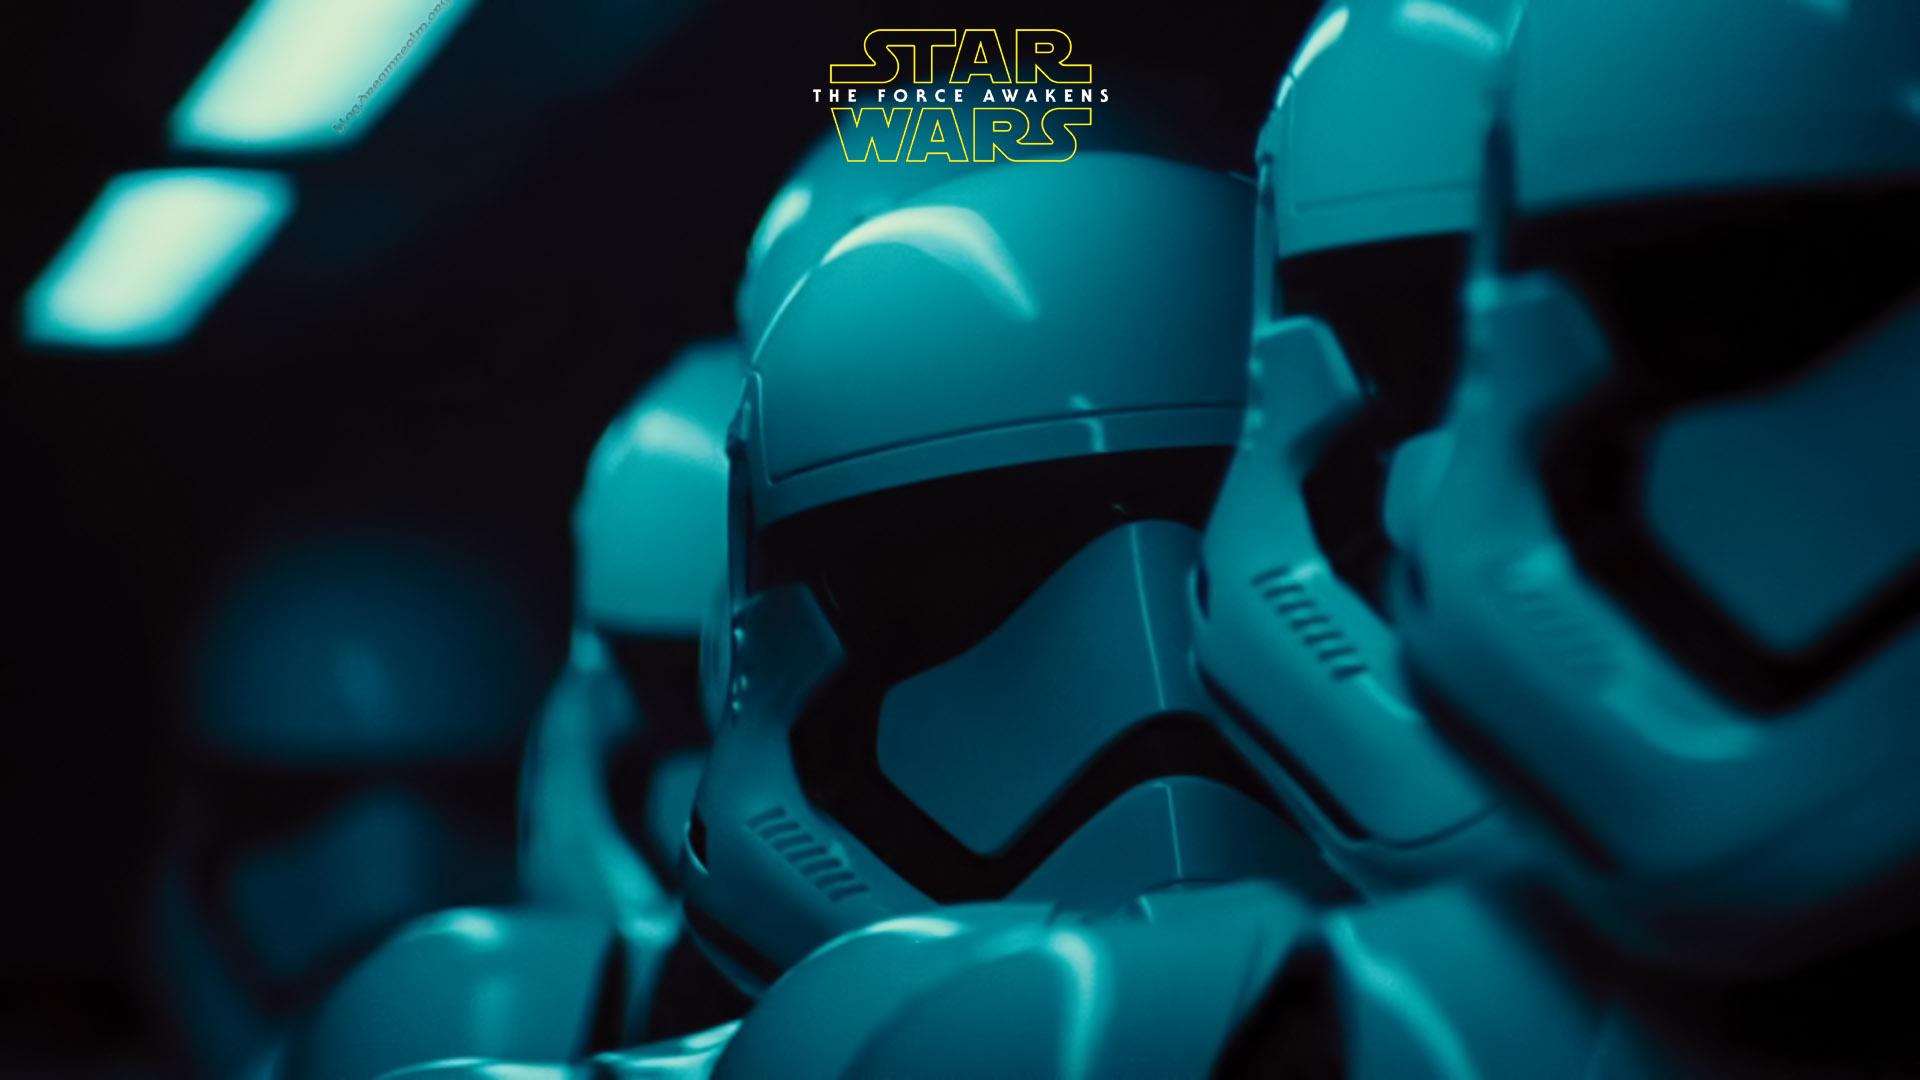 Star Wars The Force Awakens Wall 1920x1080